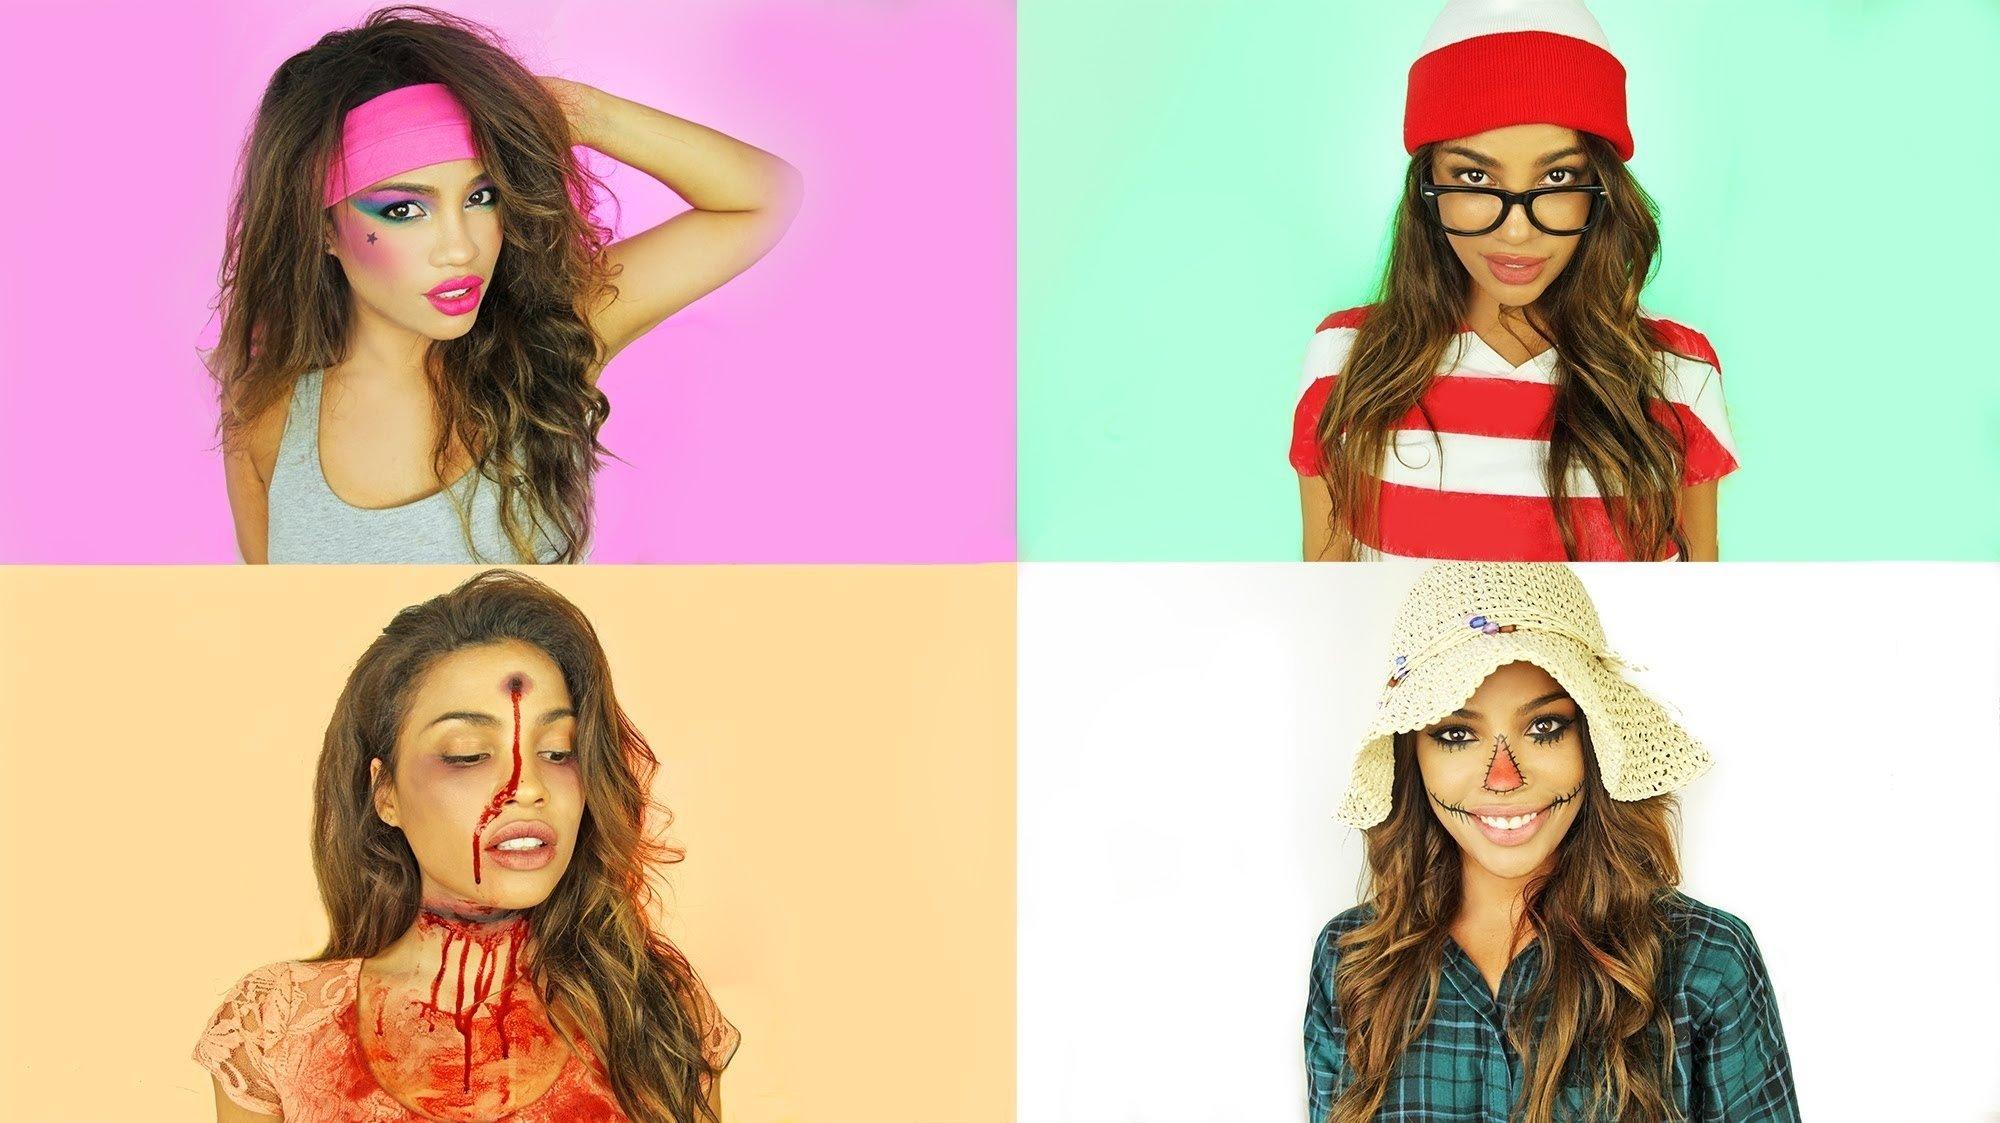 10 Famous Easy Women Halloween Costume Ideas easy diy halloween costumes ideas andreaschoice youtube 33